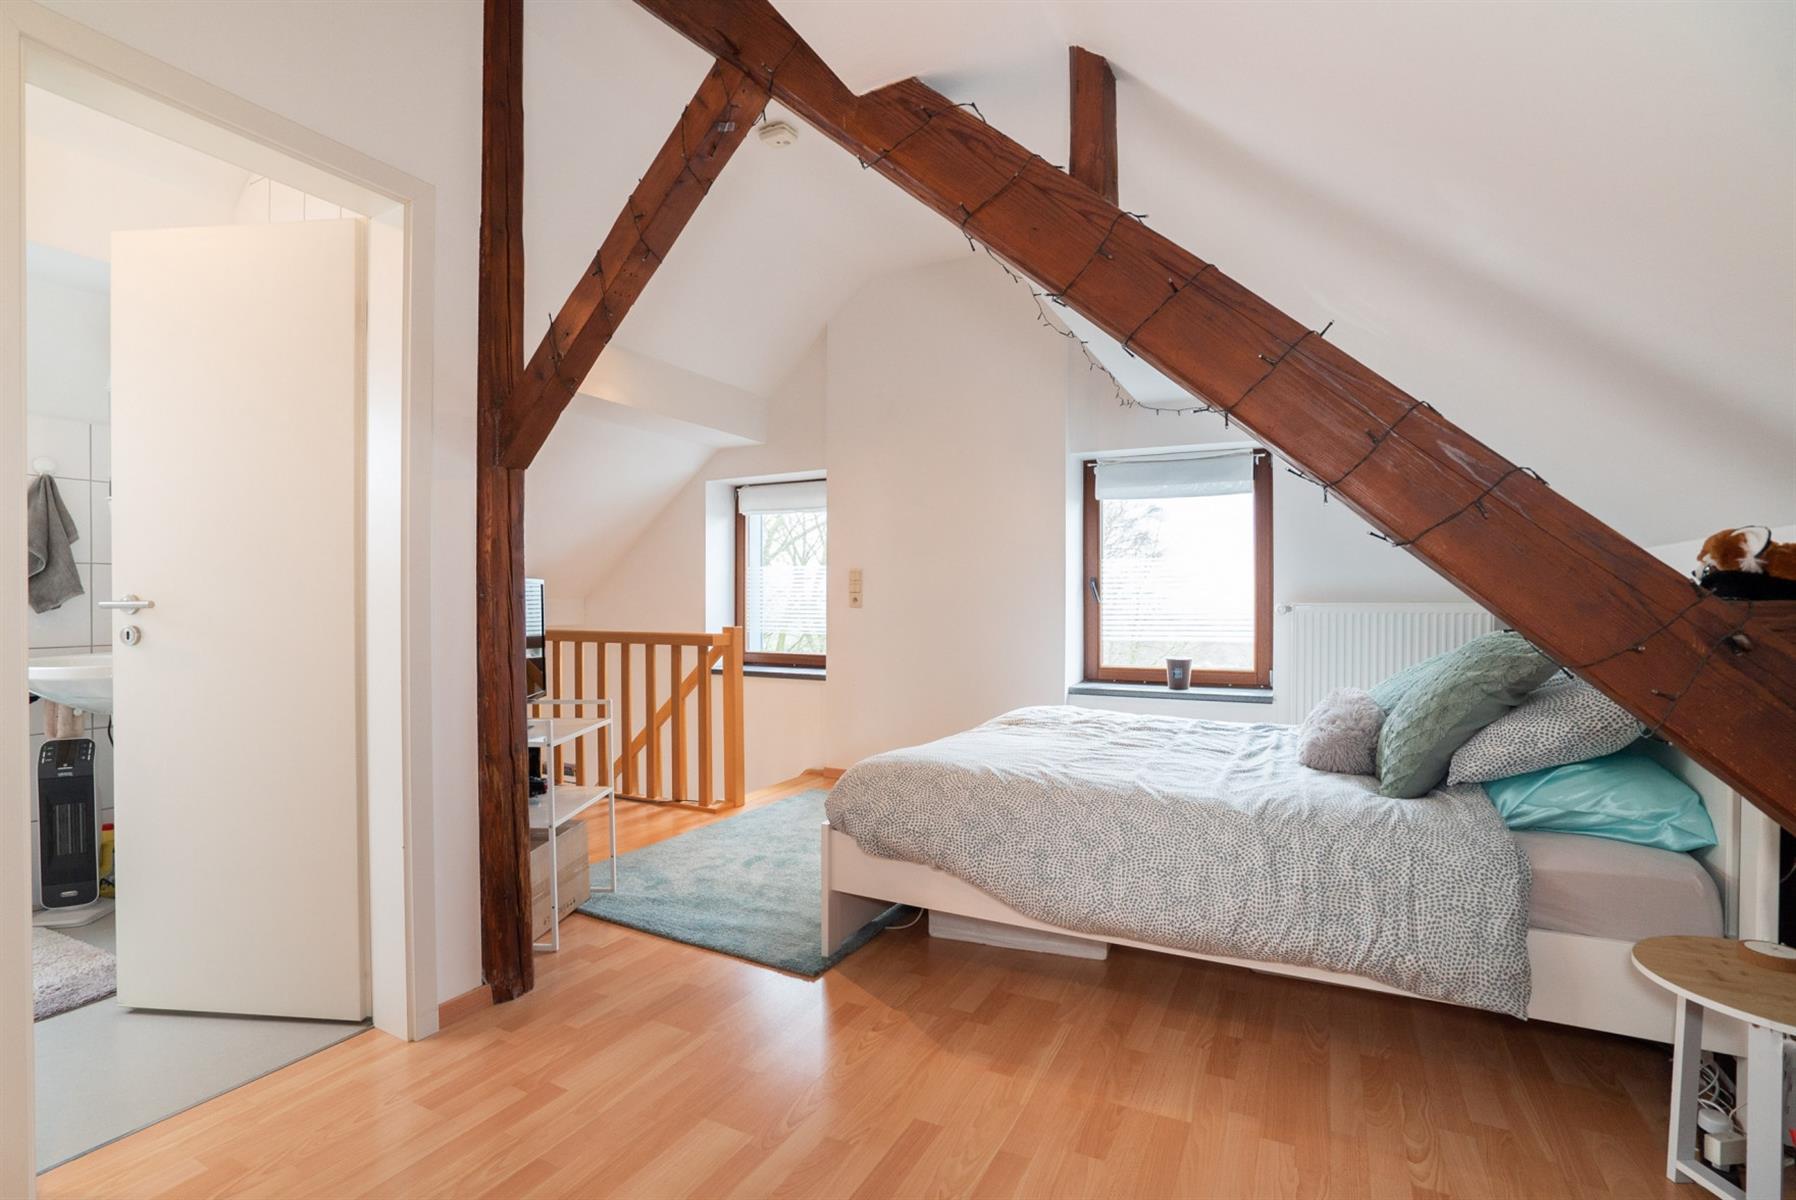 Appartement - Welkenraedt Henri-Chapelle - #4270870-7